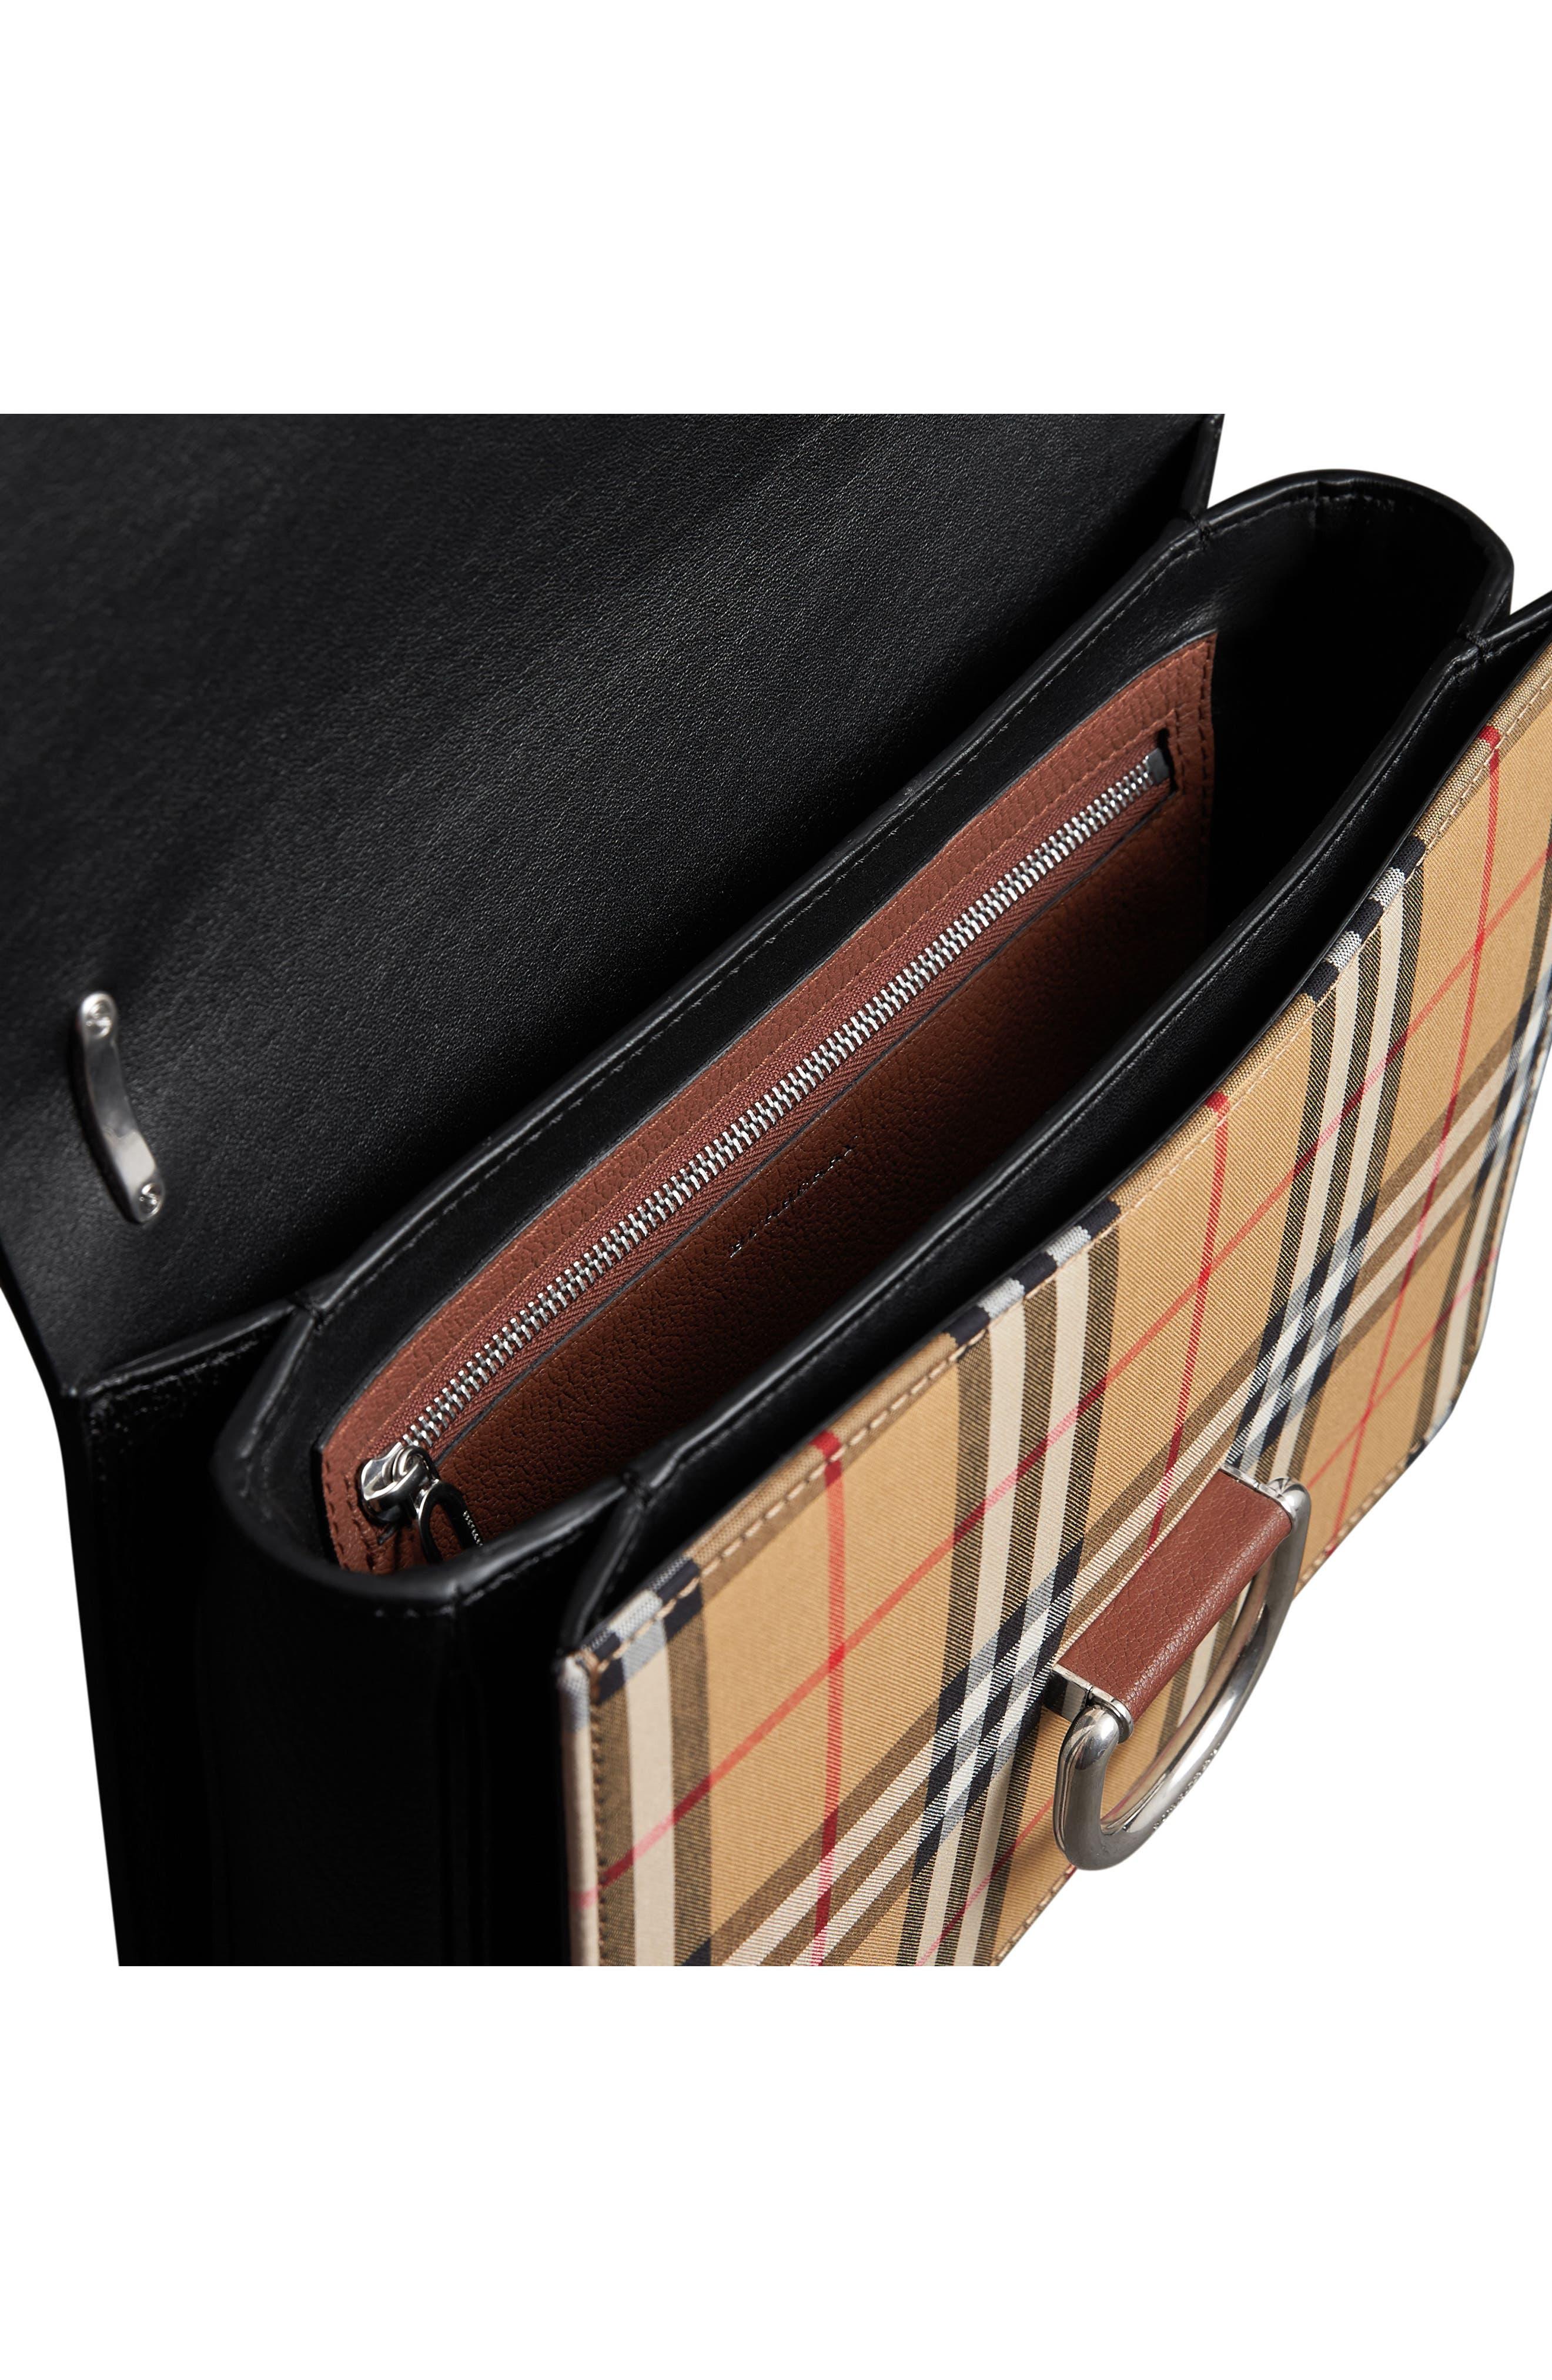 Medium D-Ring Vintage Check & Leather Crossbody Bag,                             Alternate thumbnail 8, color,                             TAN/ BLACK